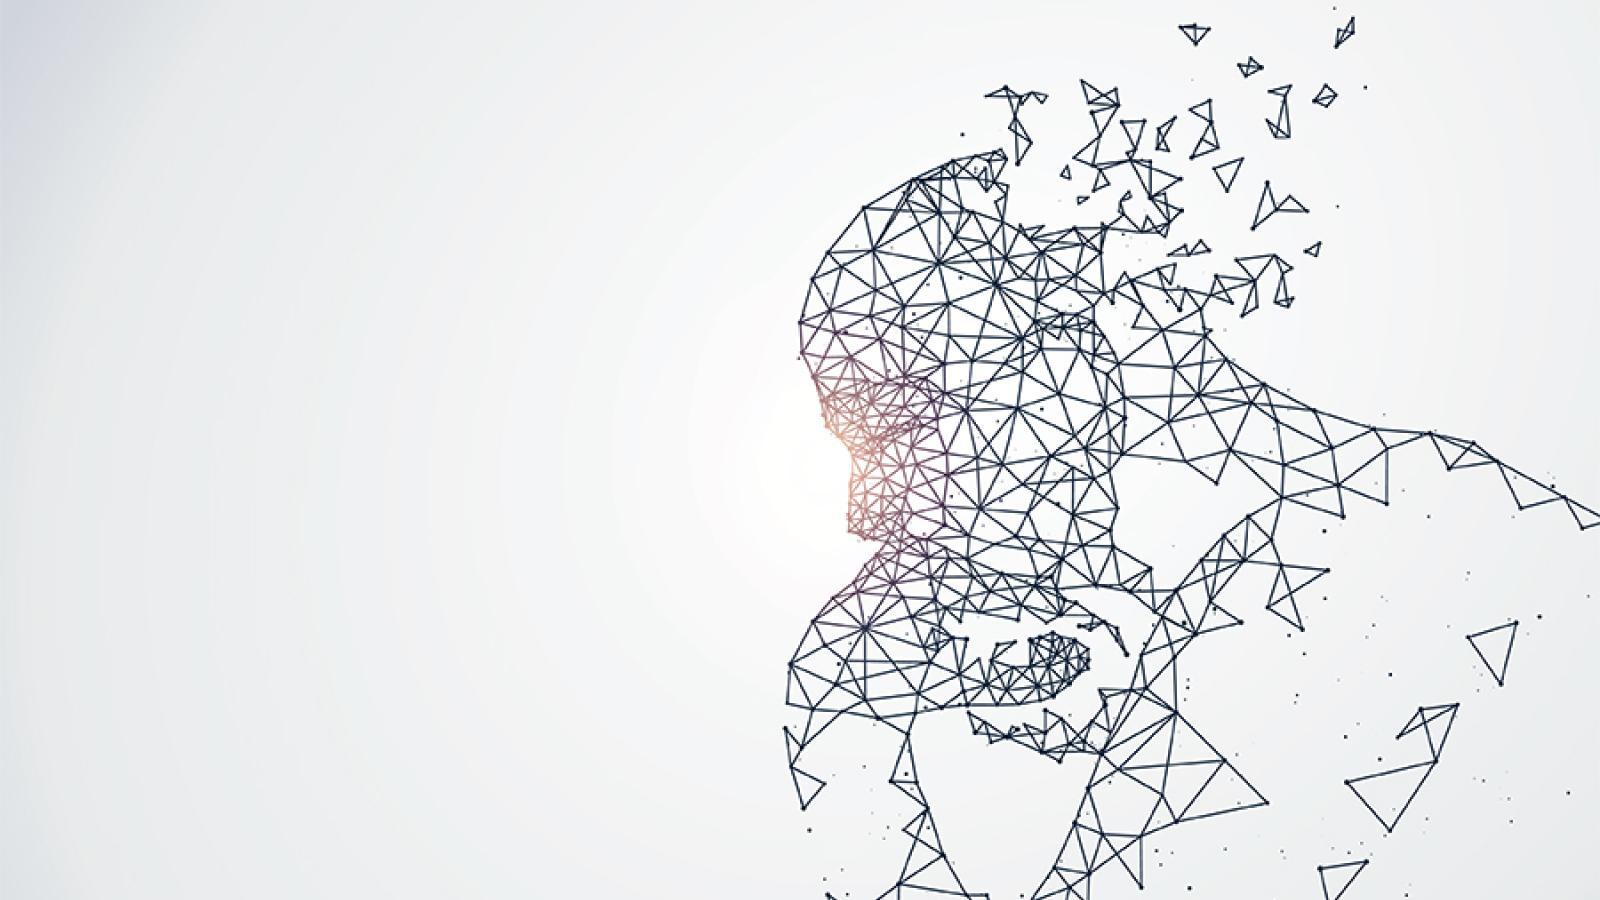 Computer generated man thinking and disintegrating